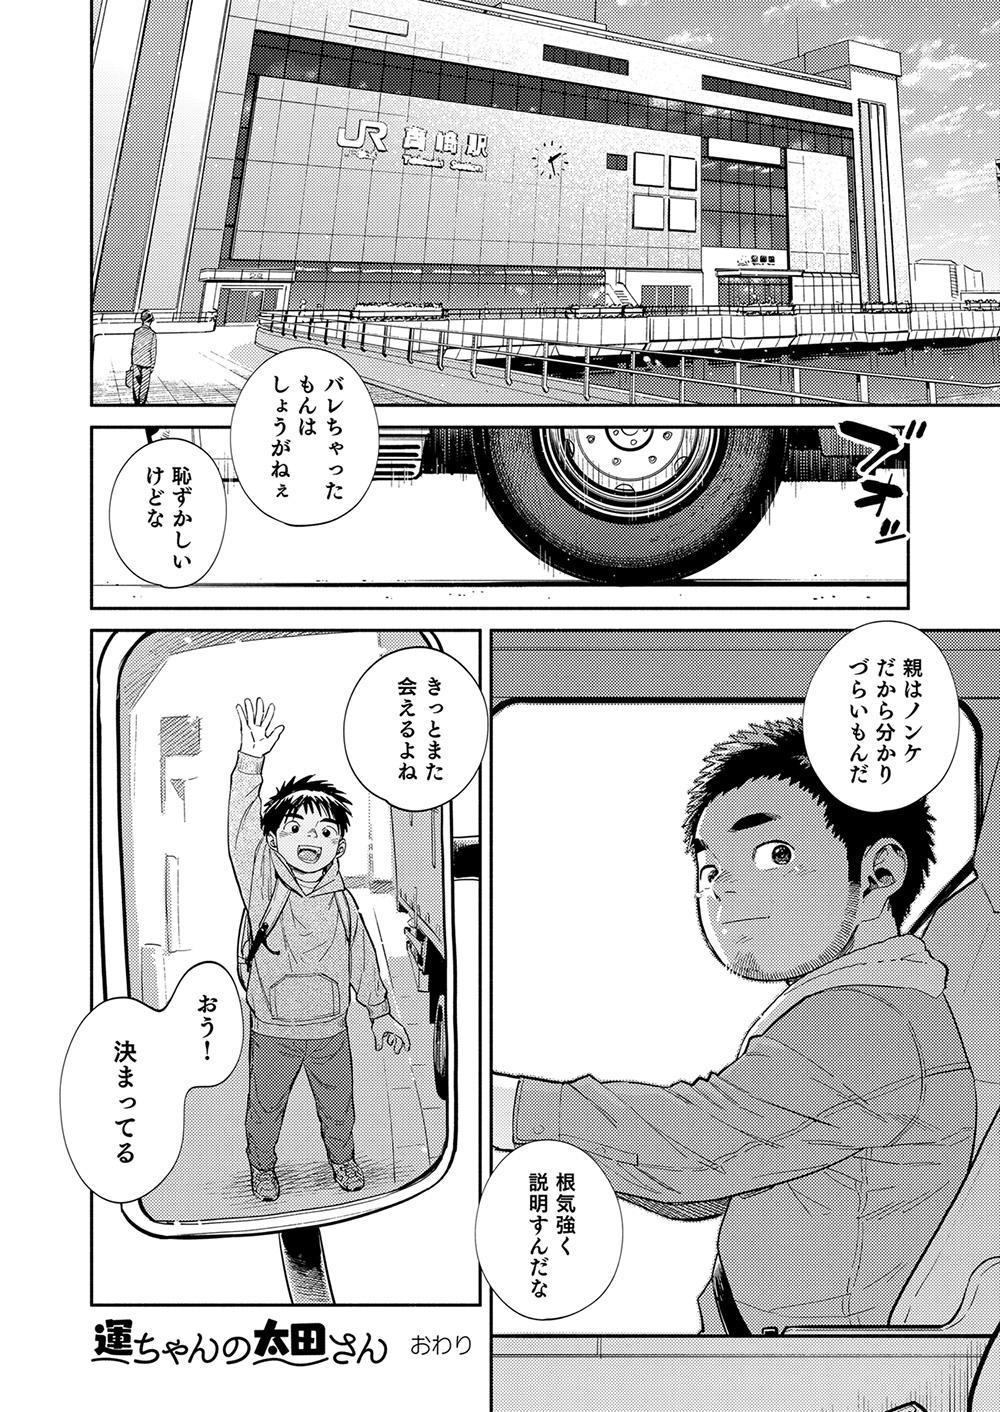 Manga Shounen Zoom Vol. 34 51